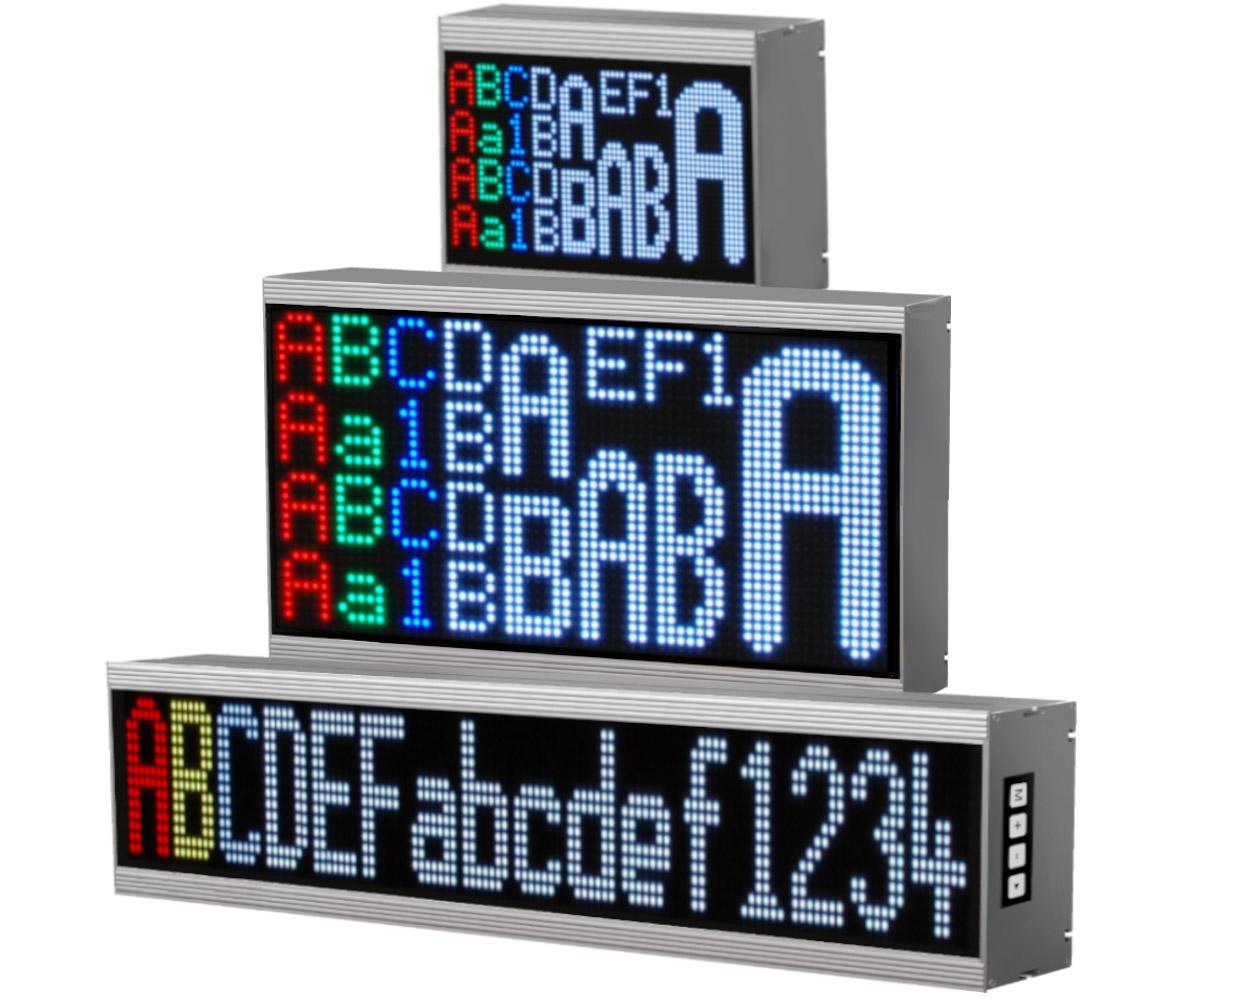 Alphanumeric large displays, 16 colors, indoor/outdoor, pixel pitch: 3-20 mm